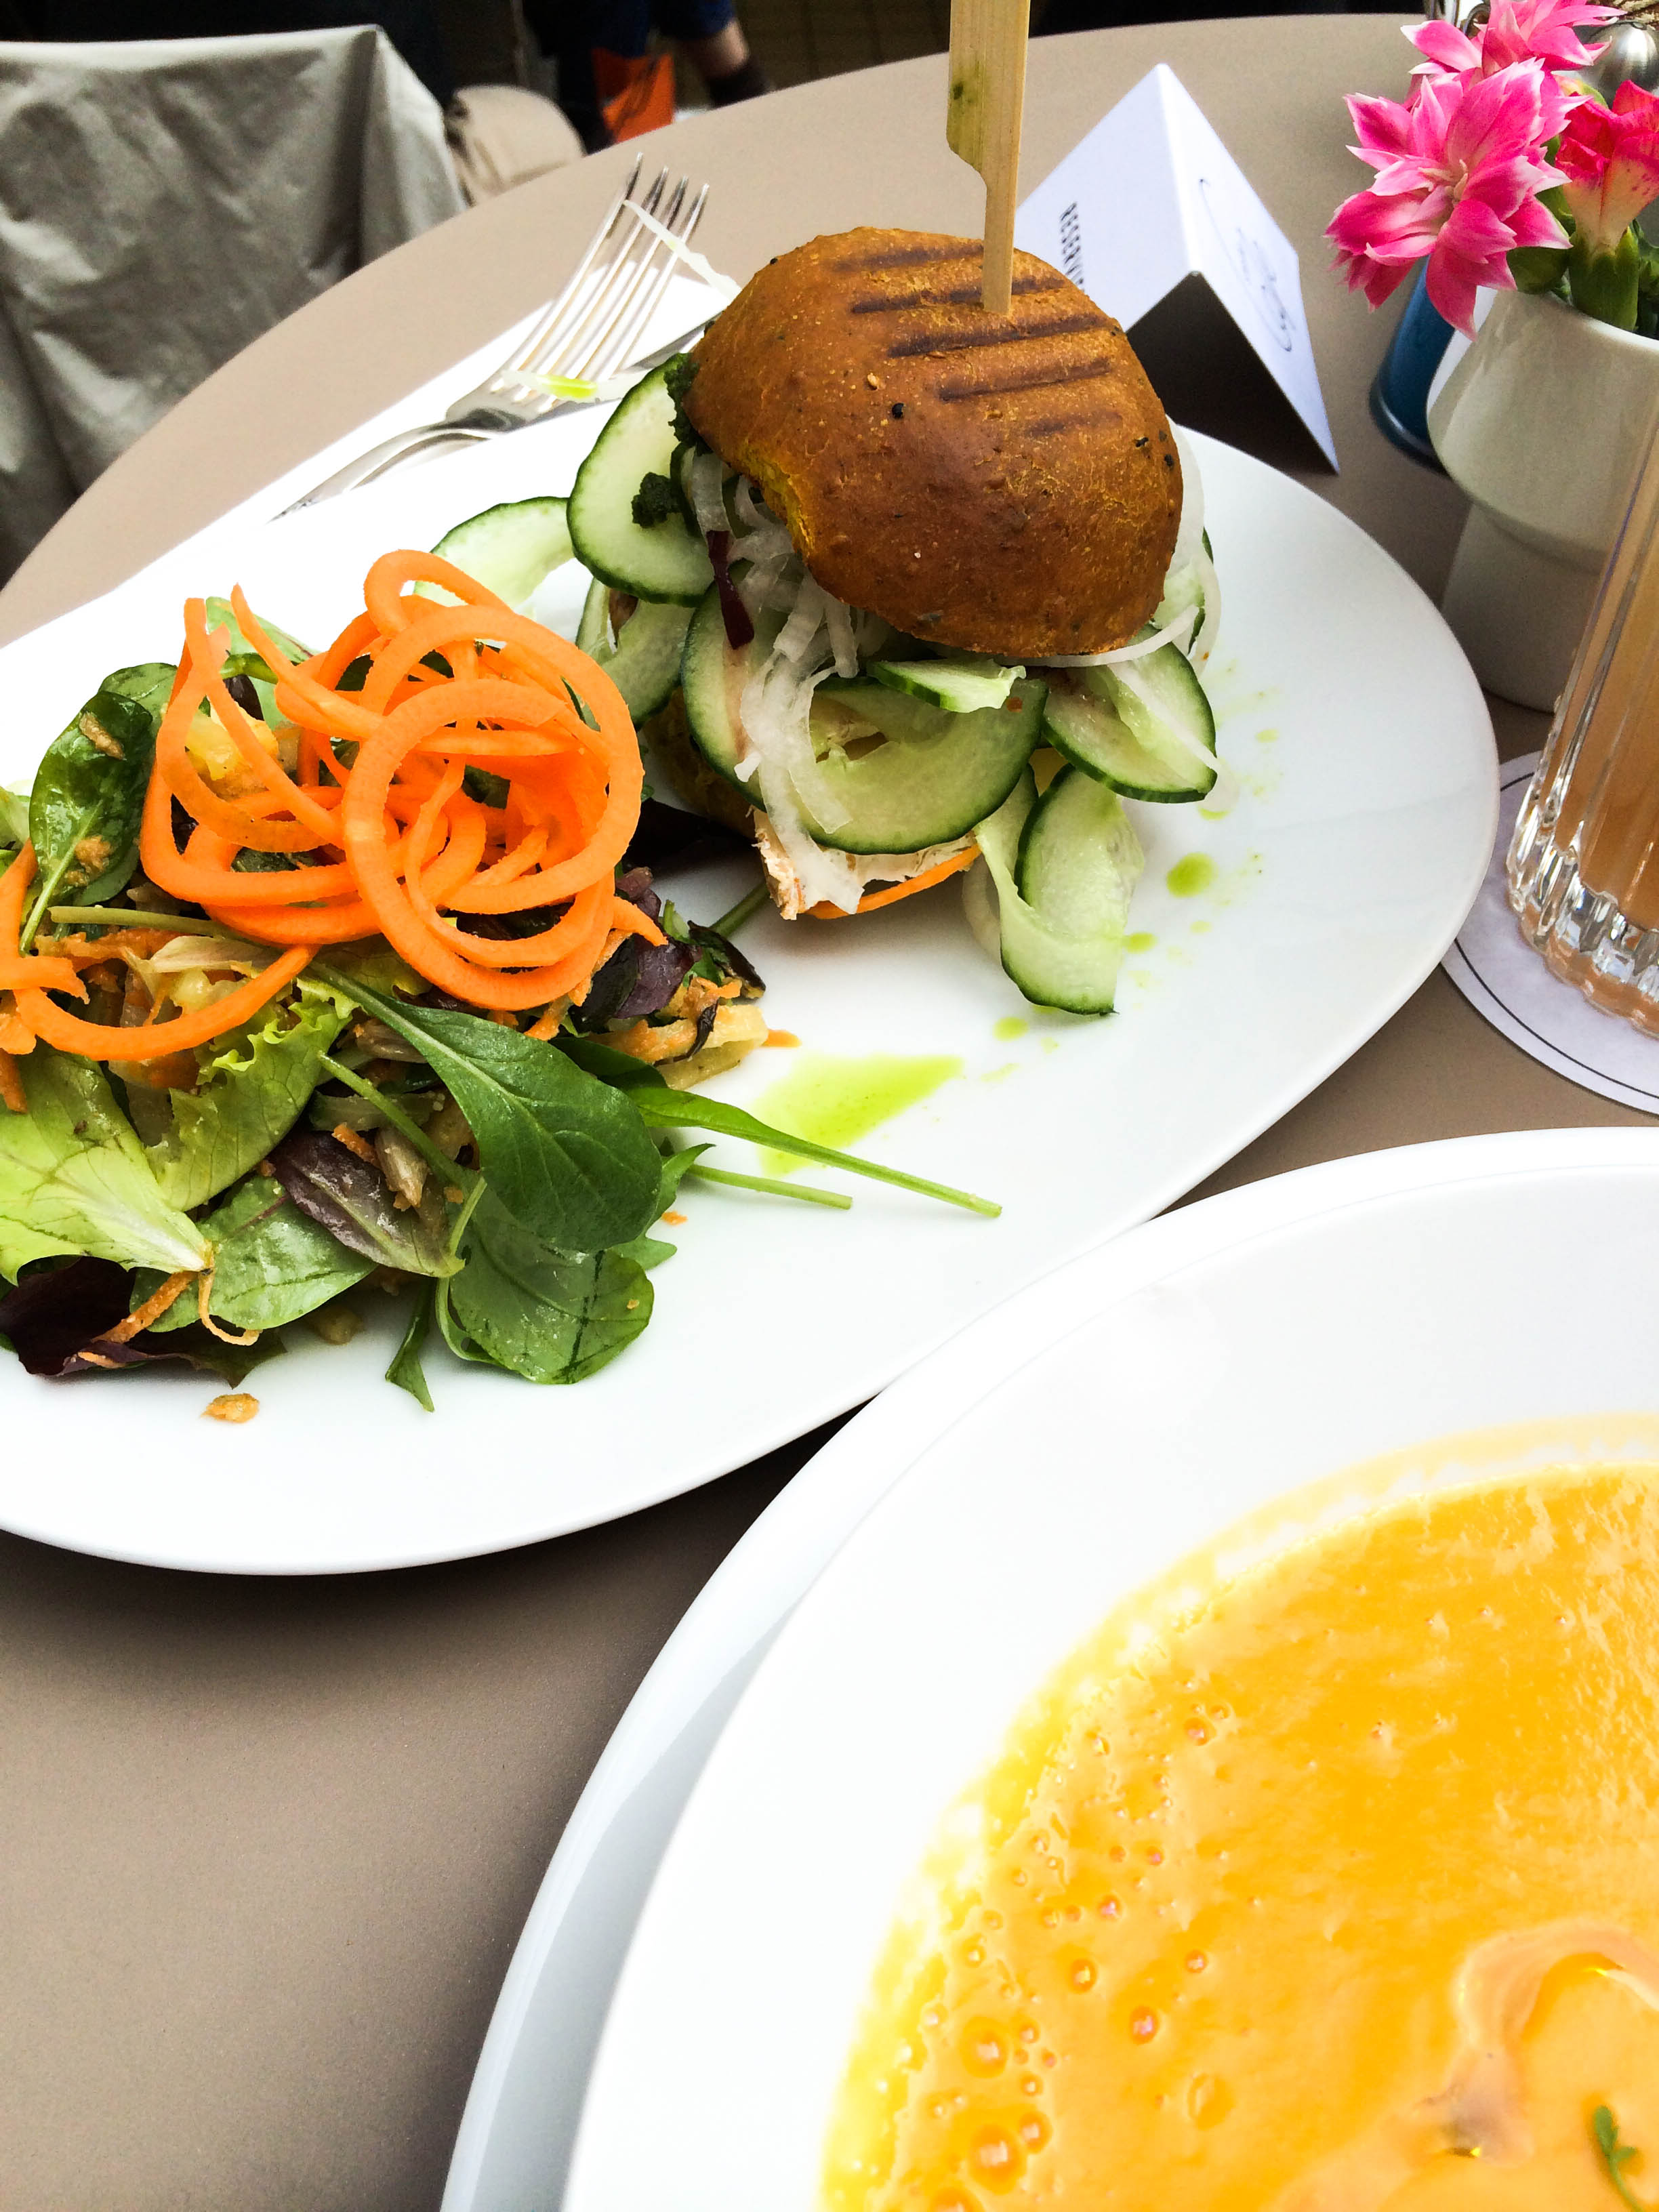 Stereo-Café-Munich-Hotspot-Lindarella-Vegan-Clean-Healthy-Foodblogger-München-Deutschland-Fitnessblog-4